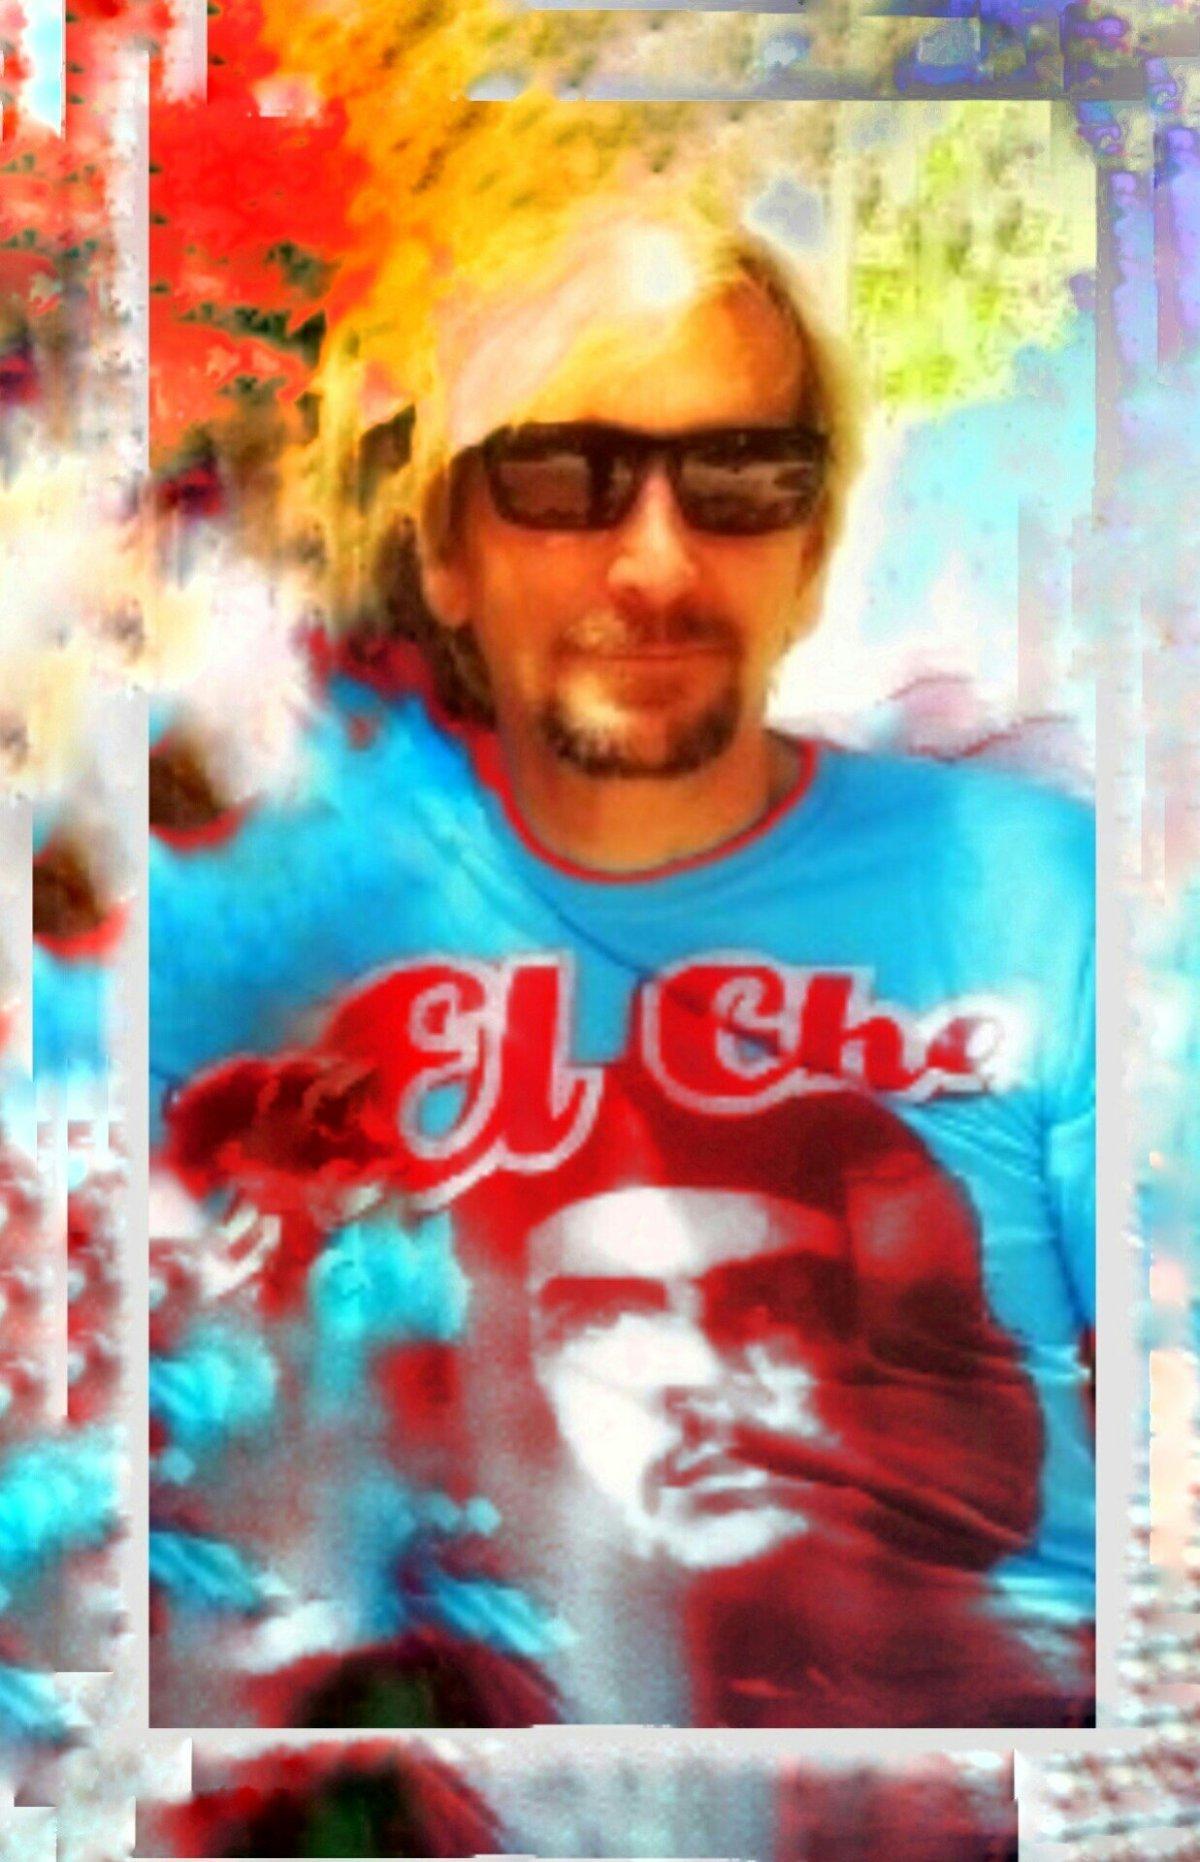 For Ernesto CheGuevara